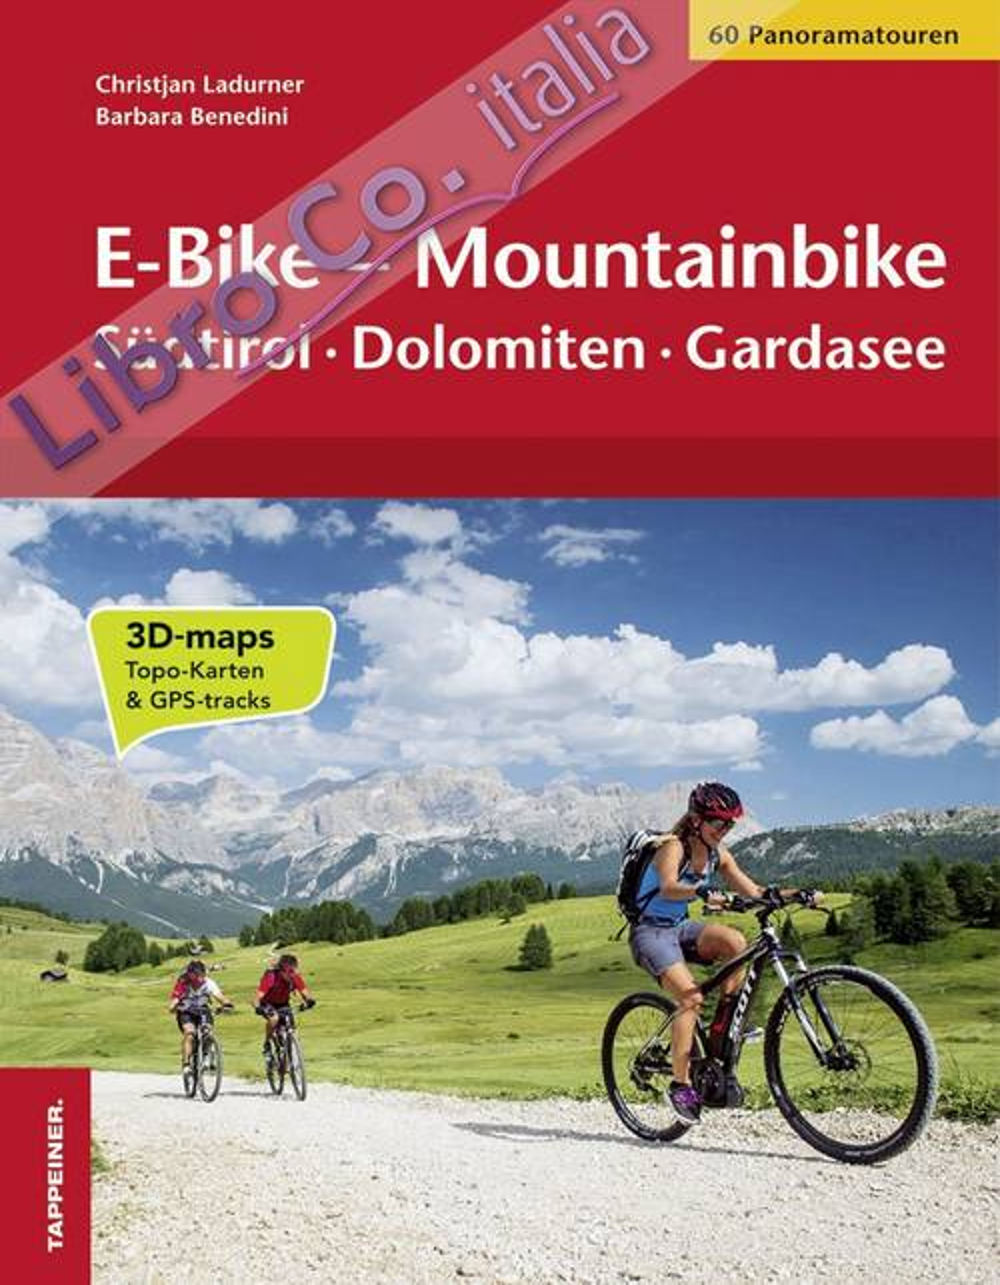 E-bike-mountainbike. Südtirol, Dolomiten, Gardasee.